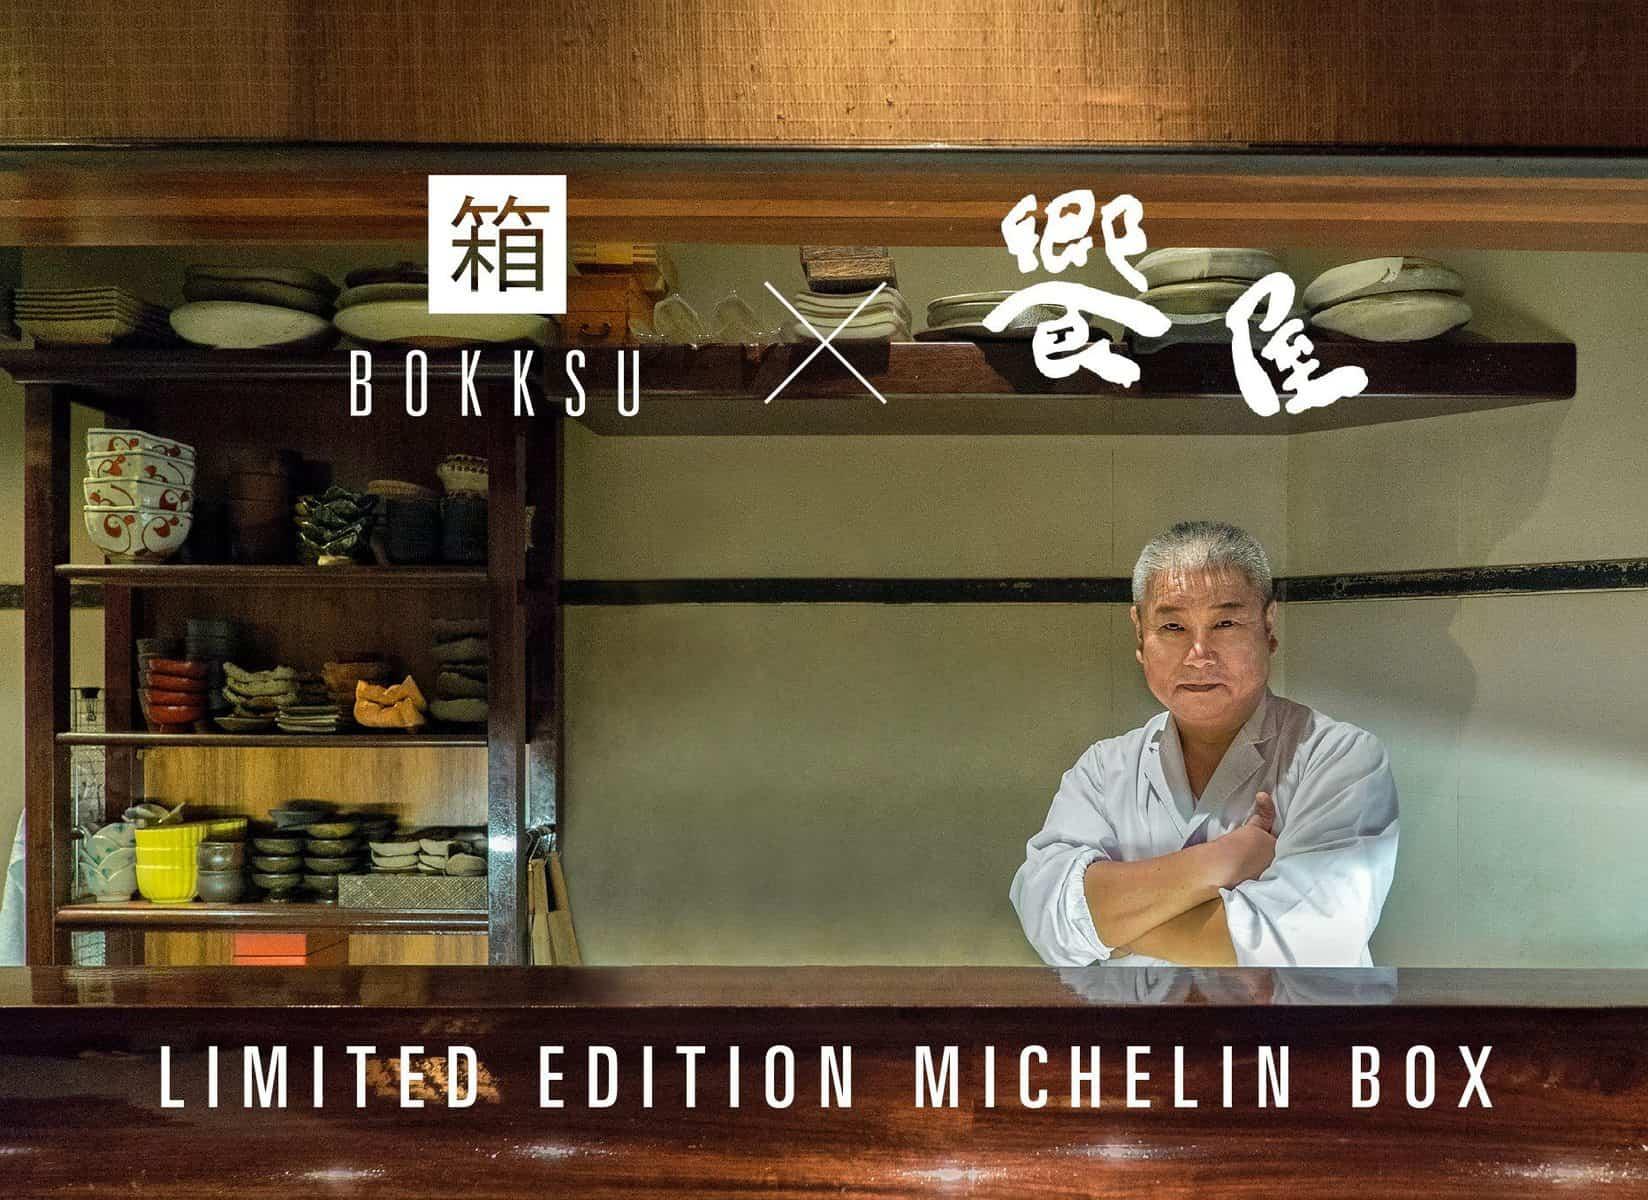 September 2017 Bokksu Limited Edition Michelin Box